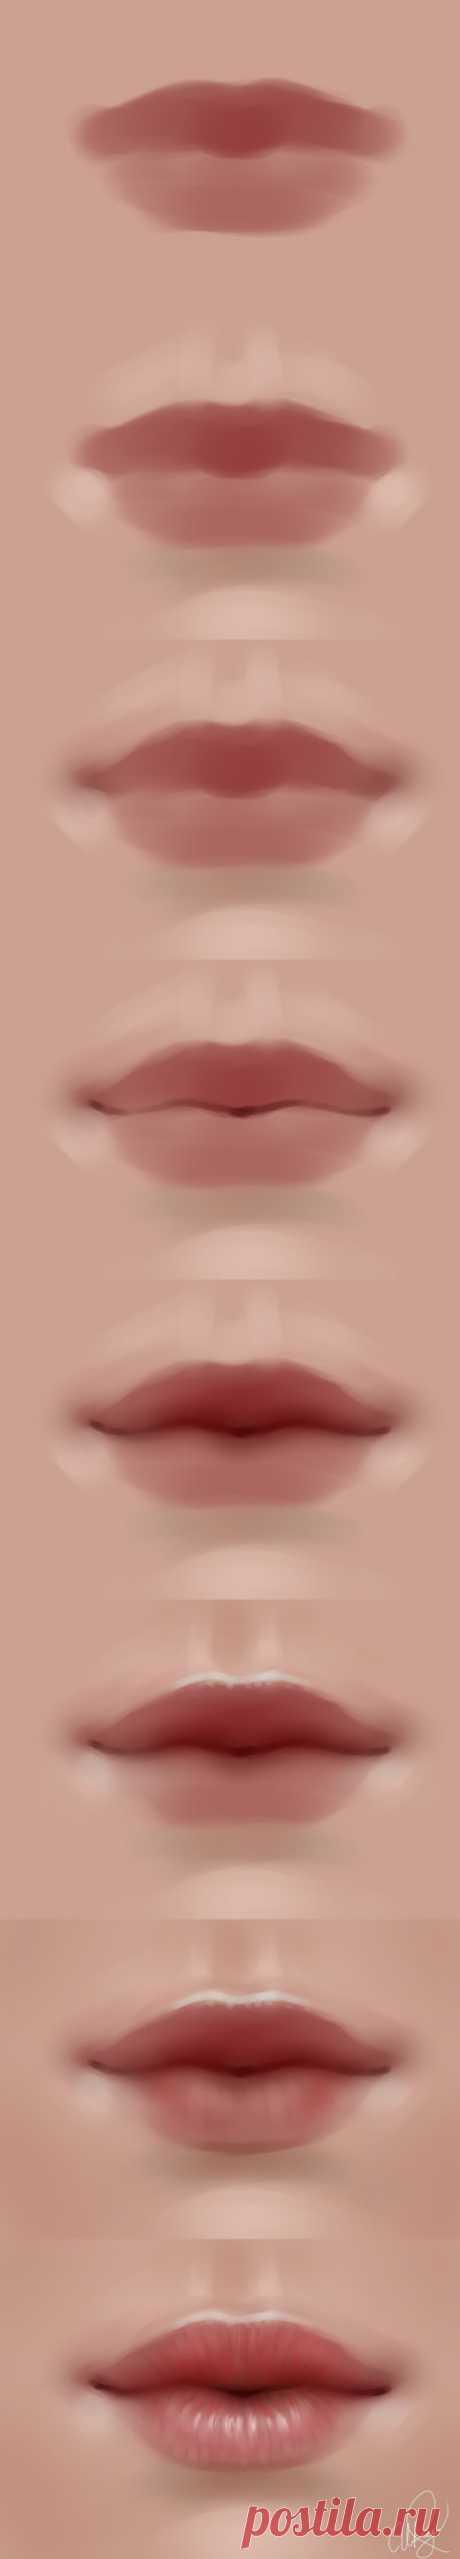 lips walkthrough by Selenada on DeviantArt